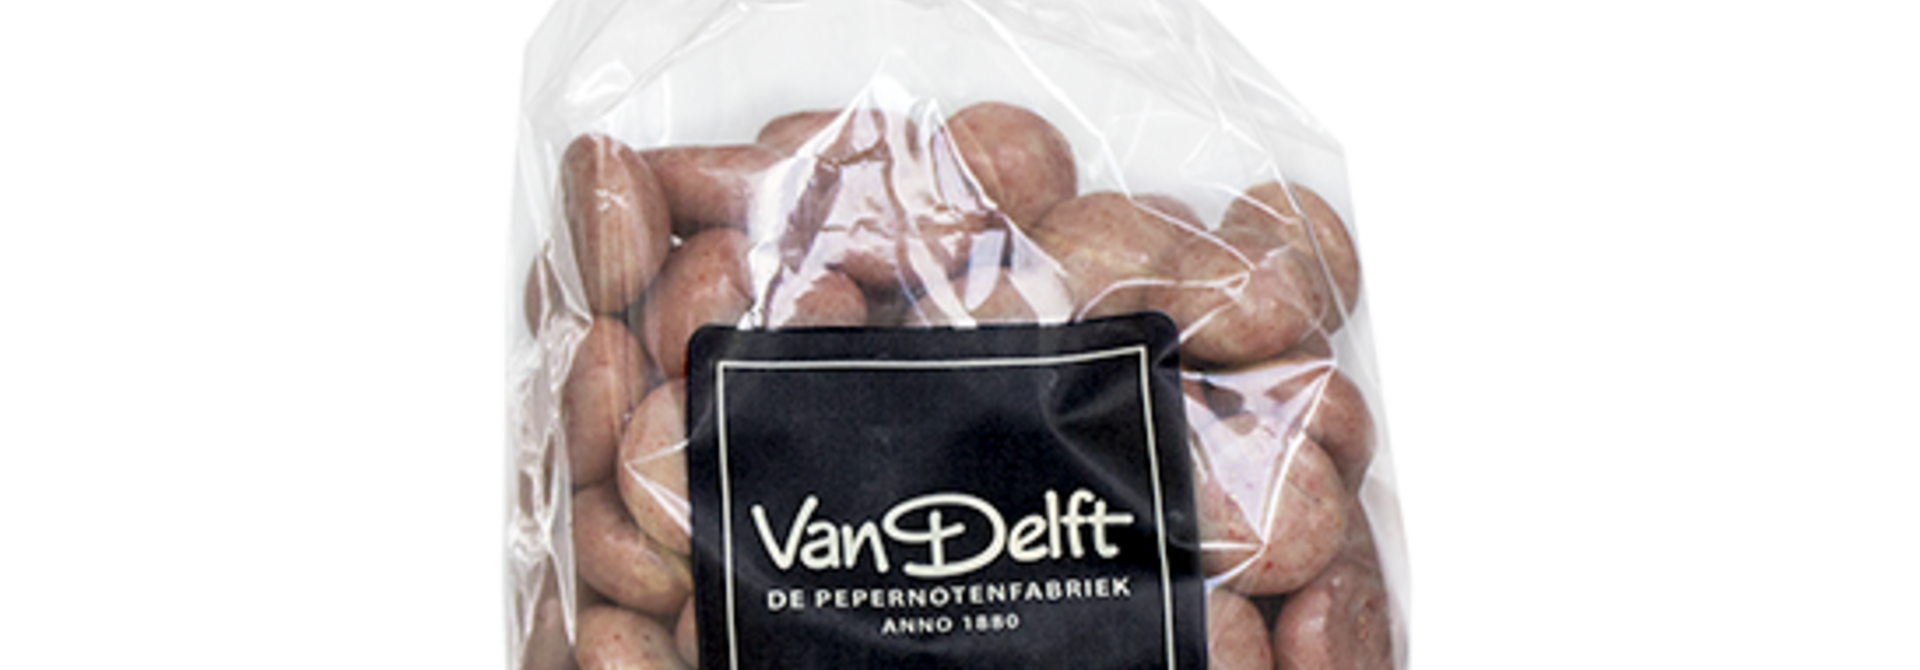 Weiße Schokolade Erdbeere Pepernoten